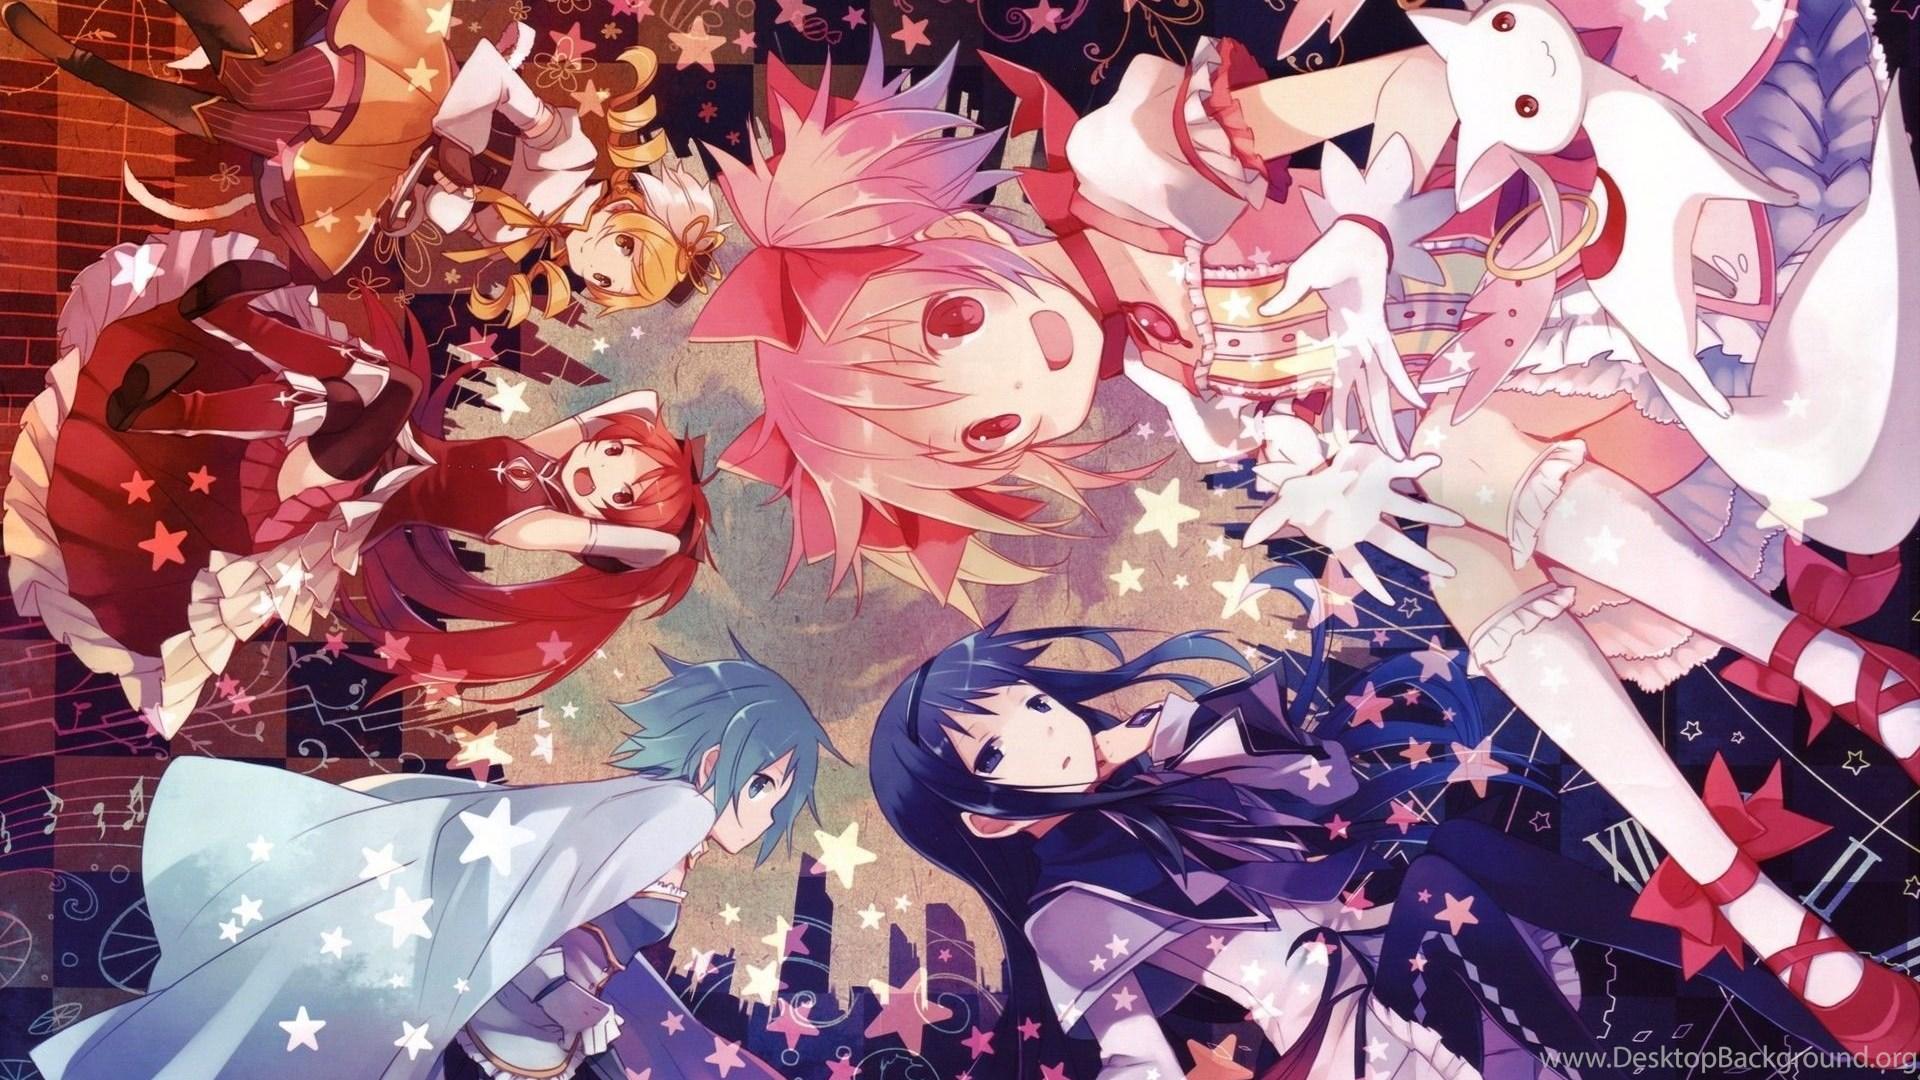 Mahou Shoujo Madoka Magica HD Wallpapers Page 3 Desktop Background